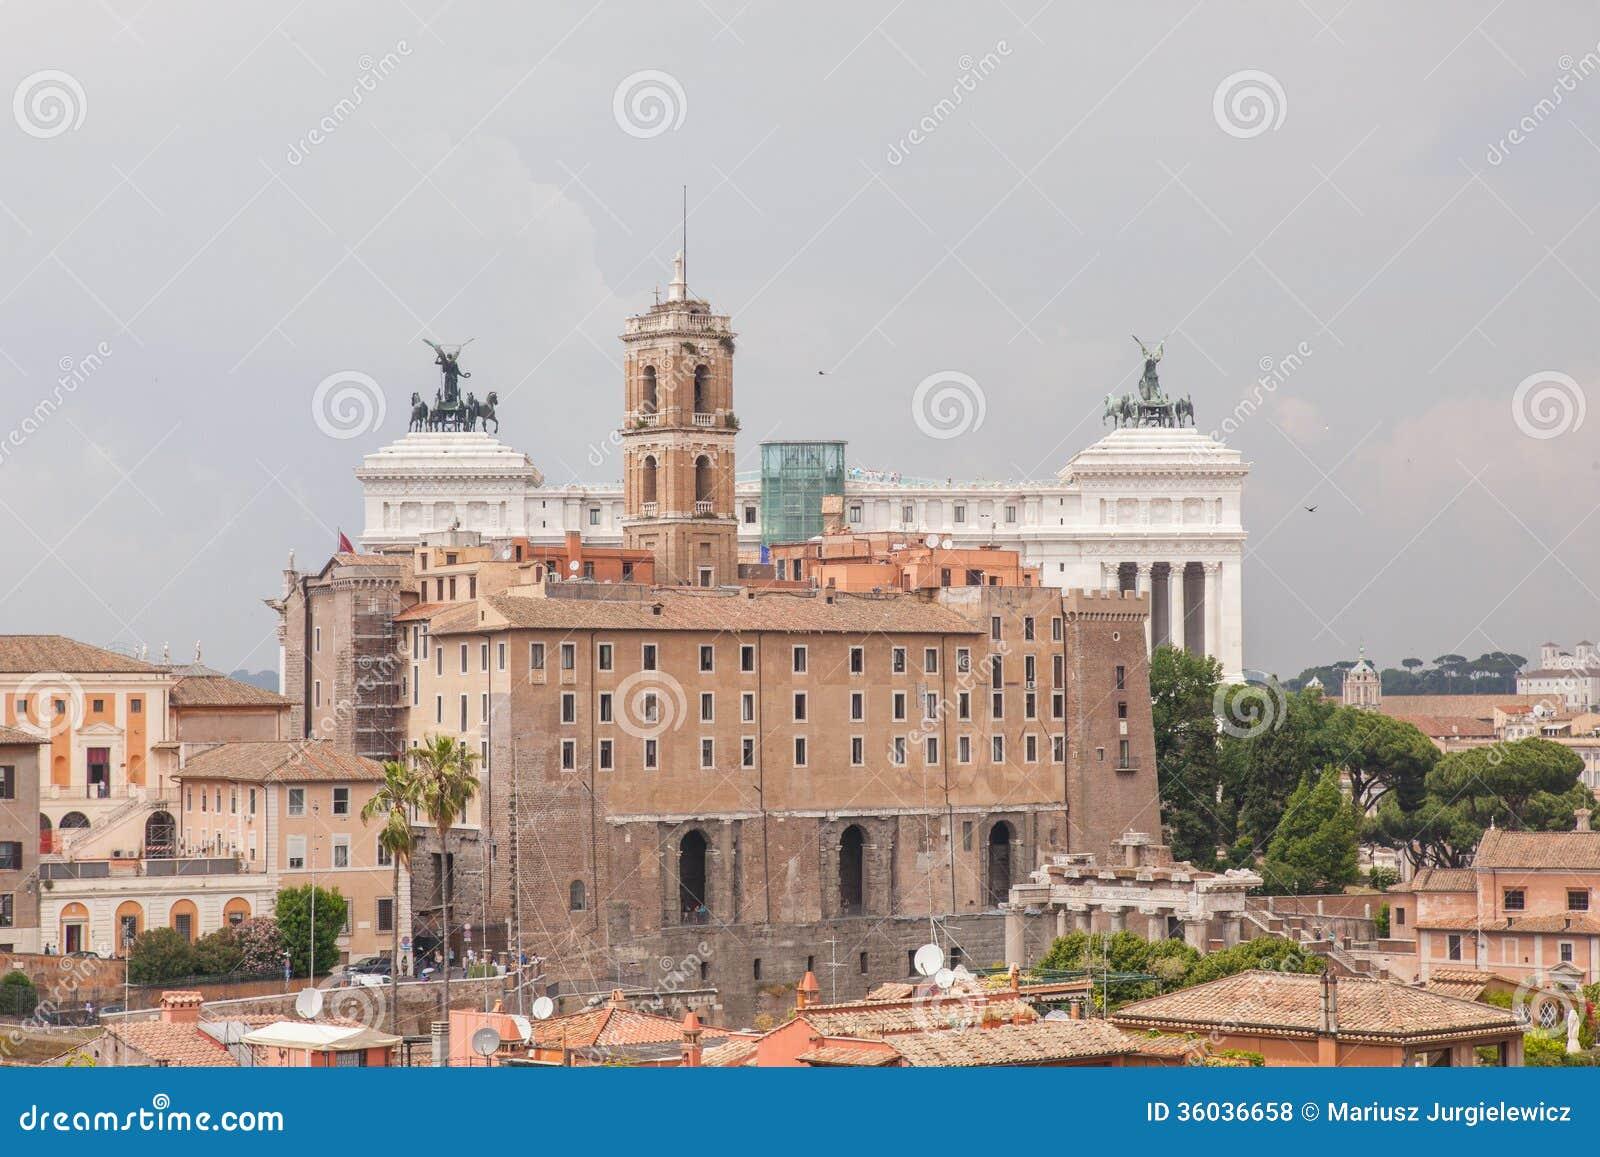 Domus Flavia Stock Photo Image Of Architecture City 36036658